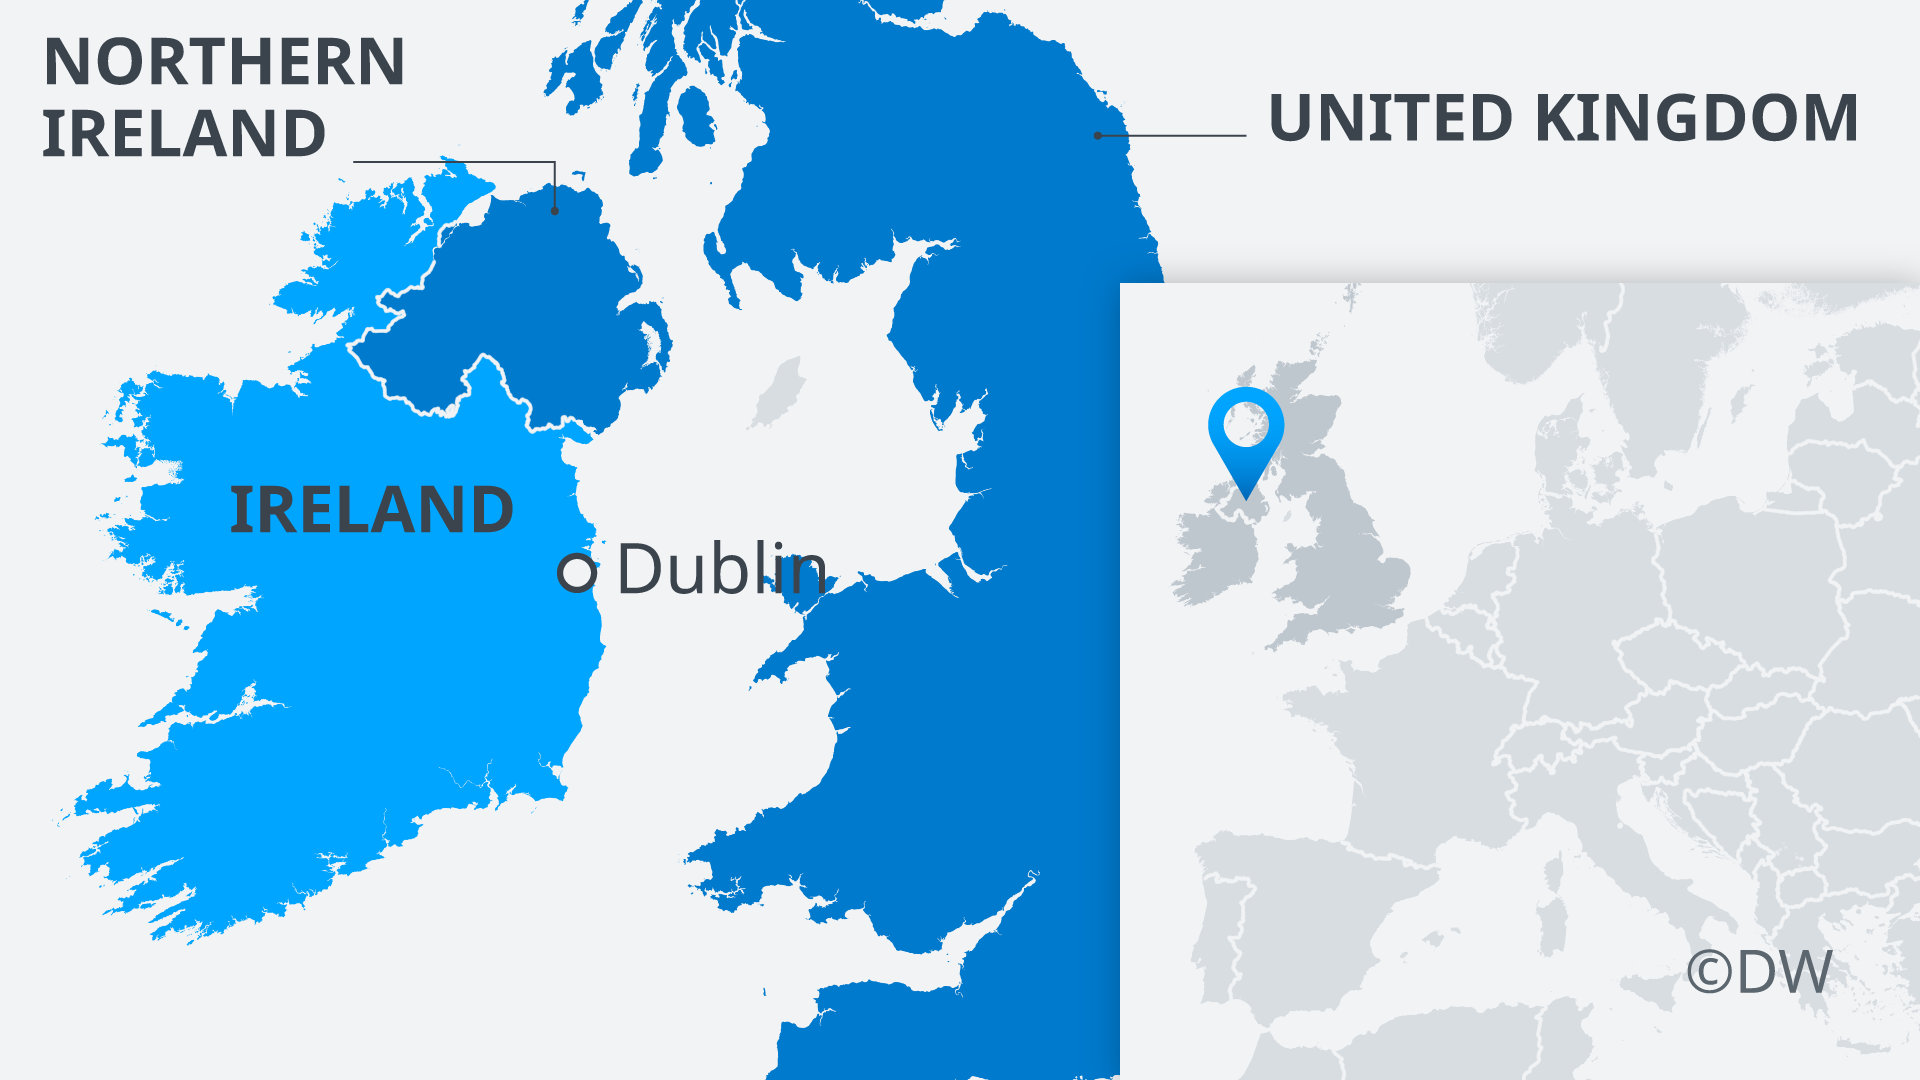 Map of Ireland and Northern Ireland